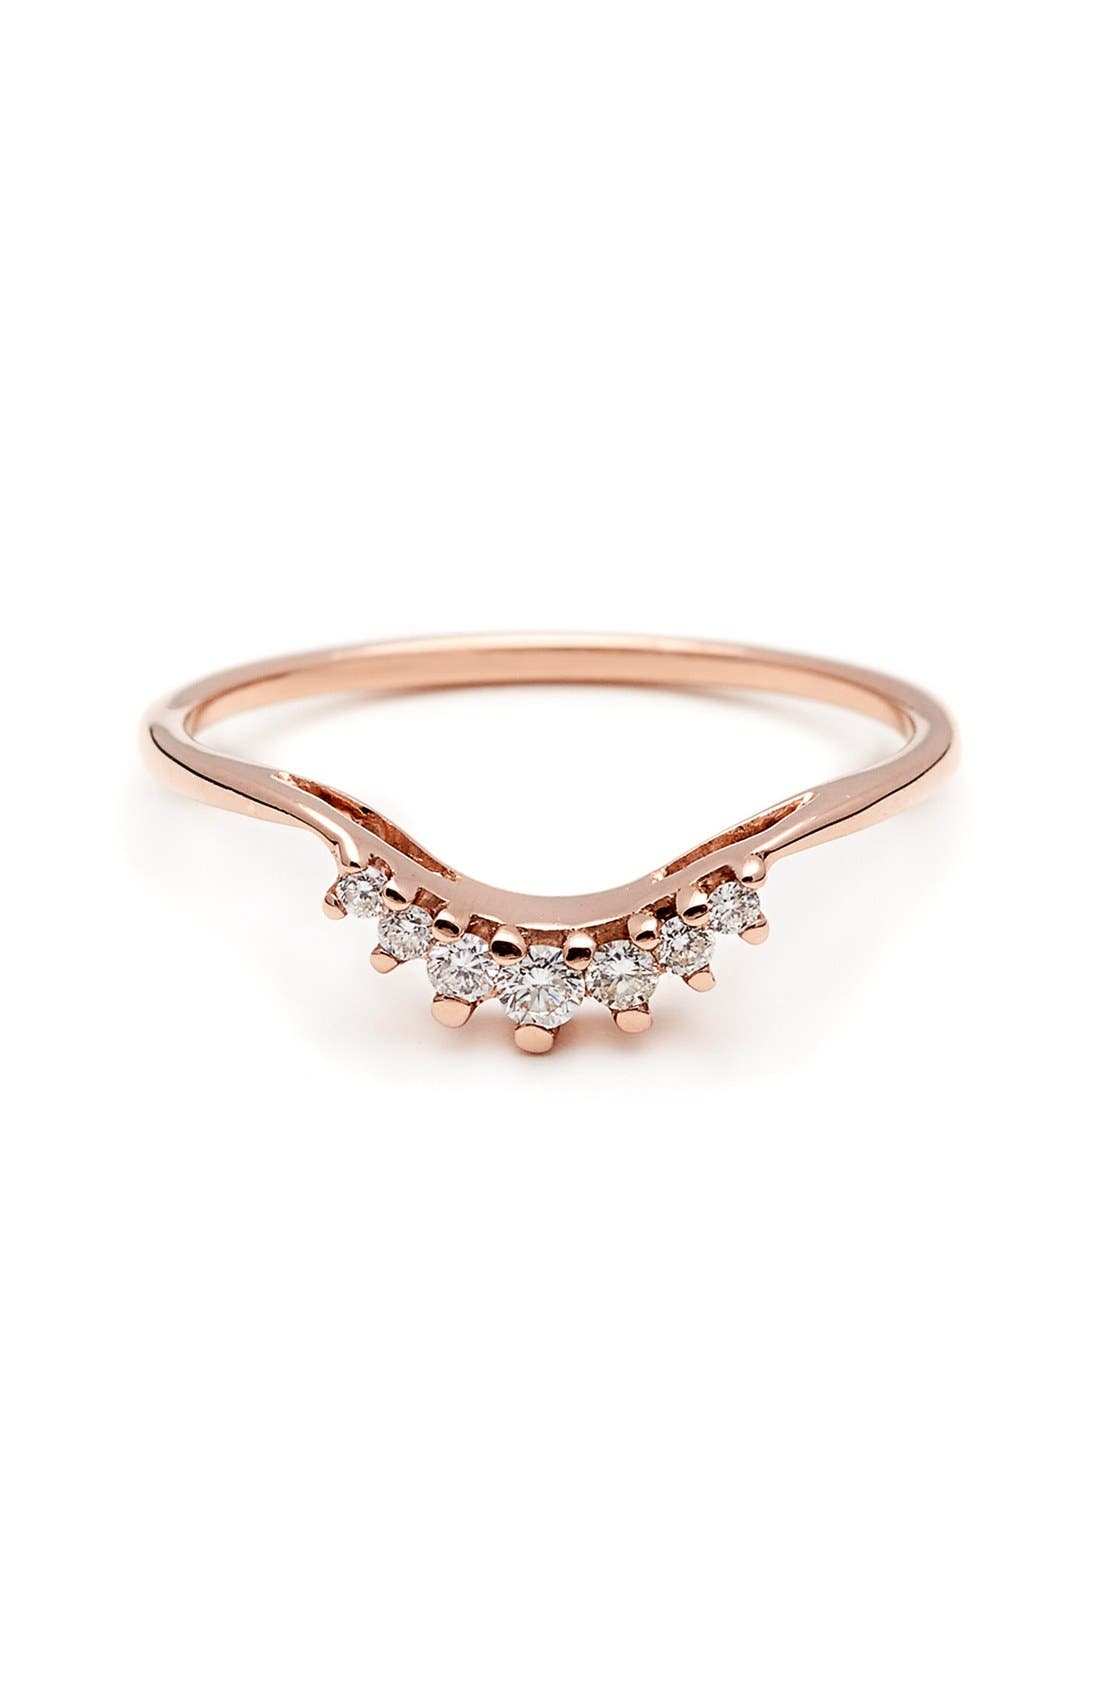 'Luna Tiara' Diamond Ring,                             Main thumbnail 1, color,                             Rose/ Gold/ White